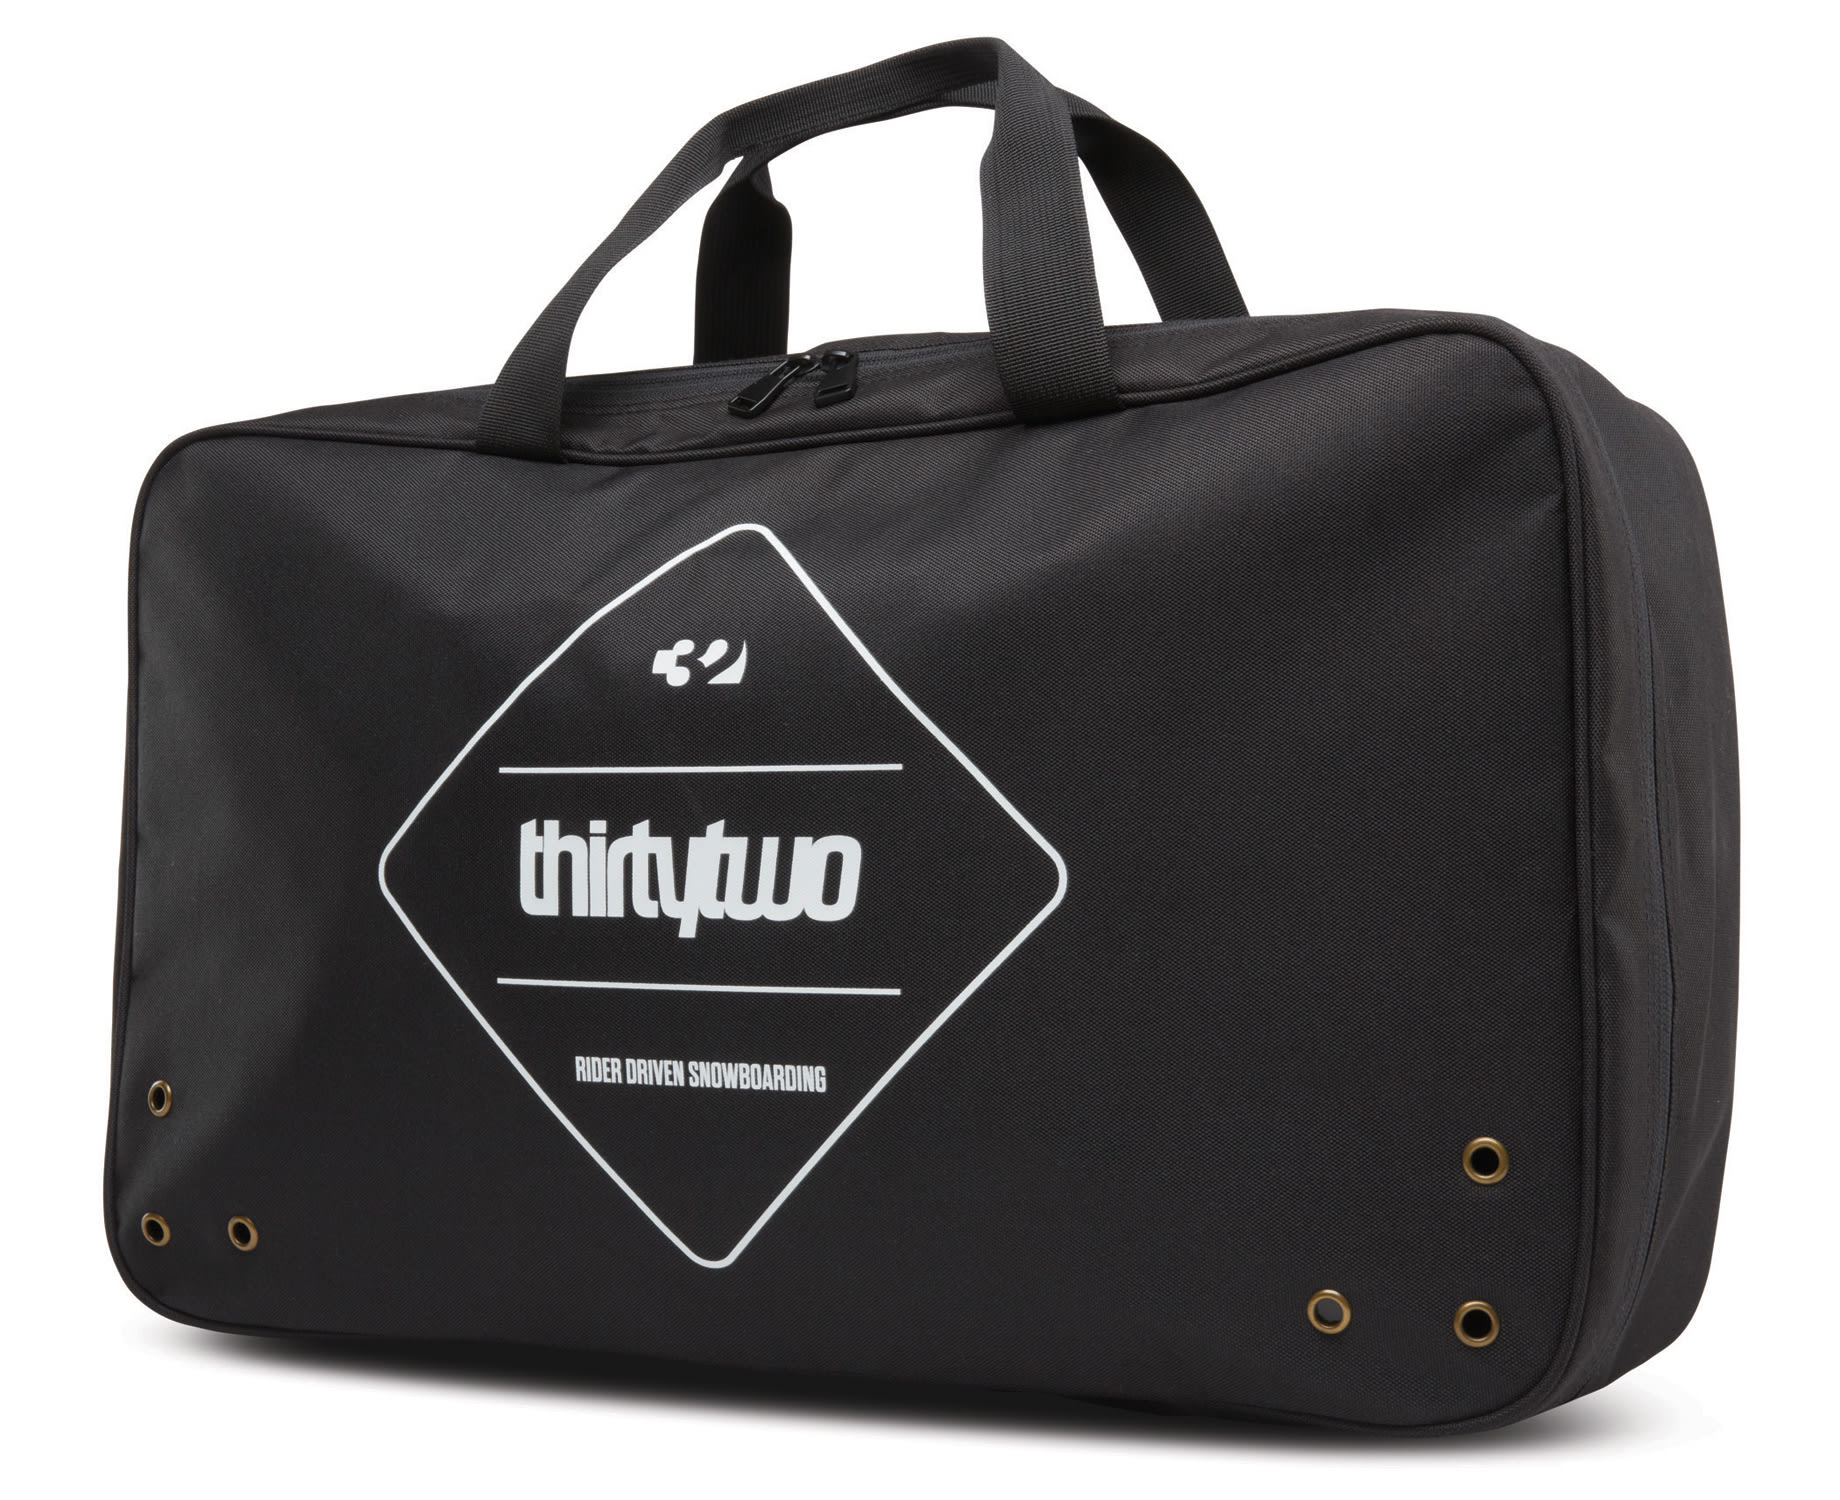 32 Thirty Two Wilhelm Duffel Boot Bag